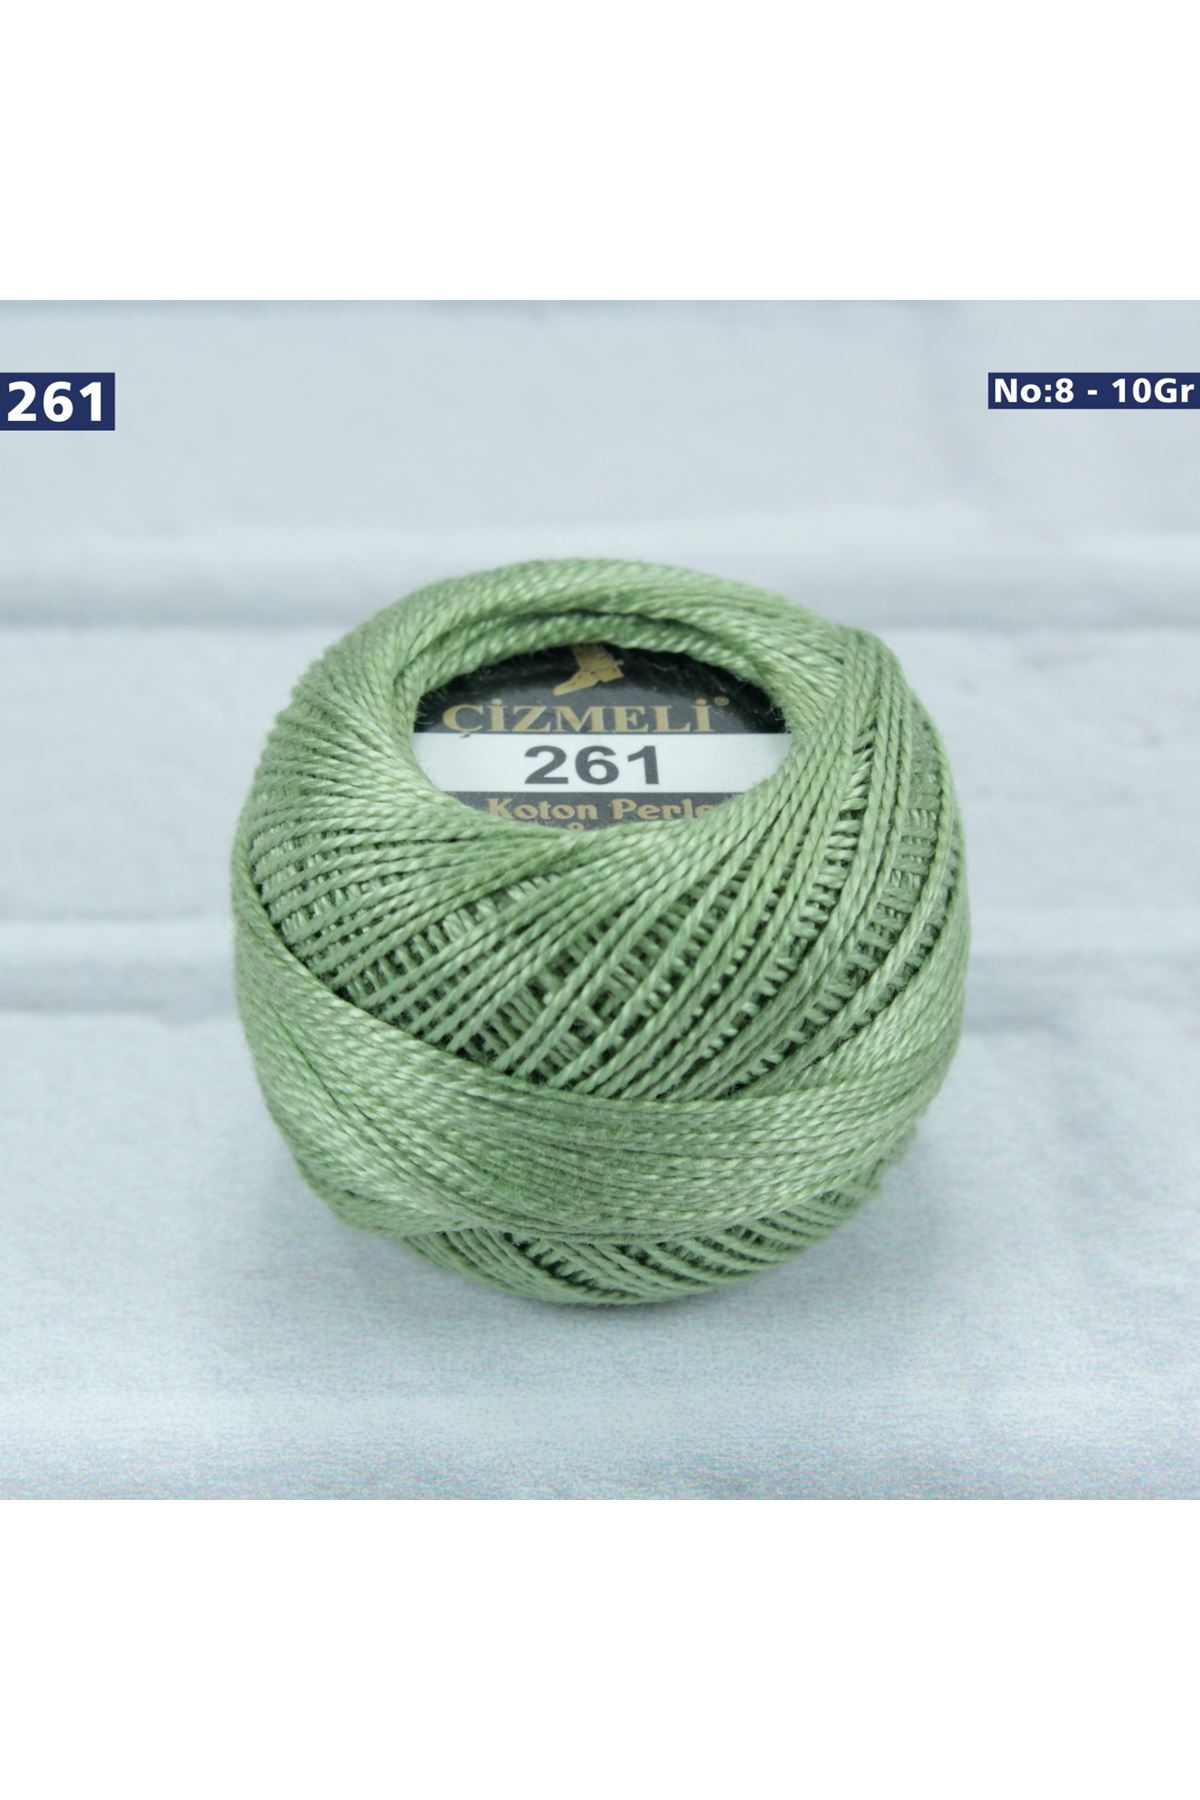 Çizmeli Cotton Perle Nakış İpliği No: 261